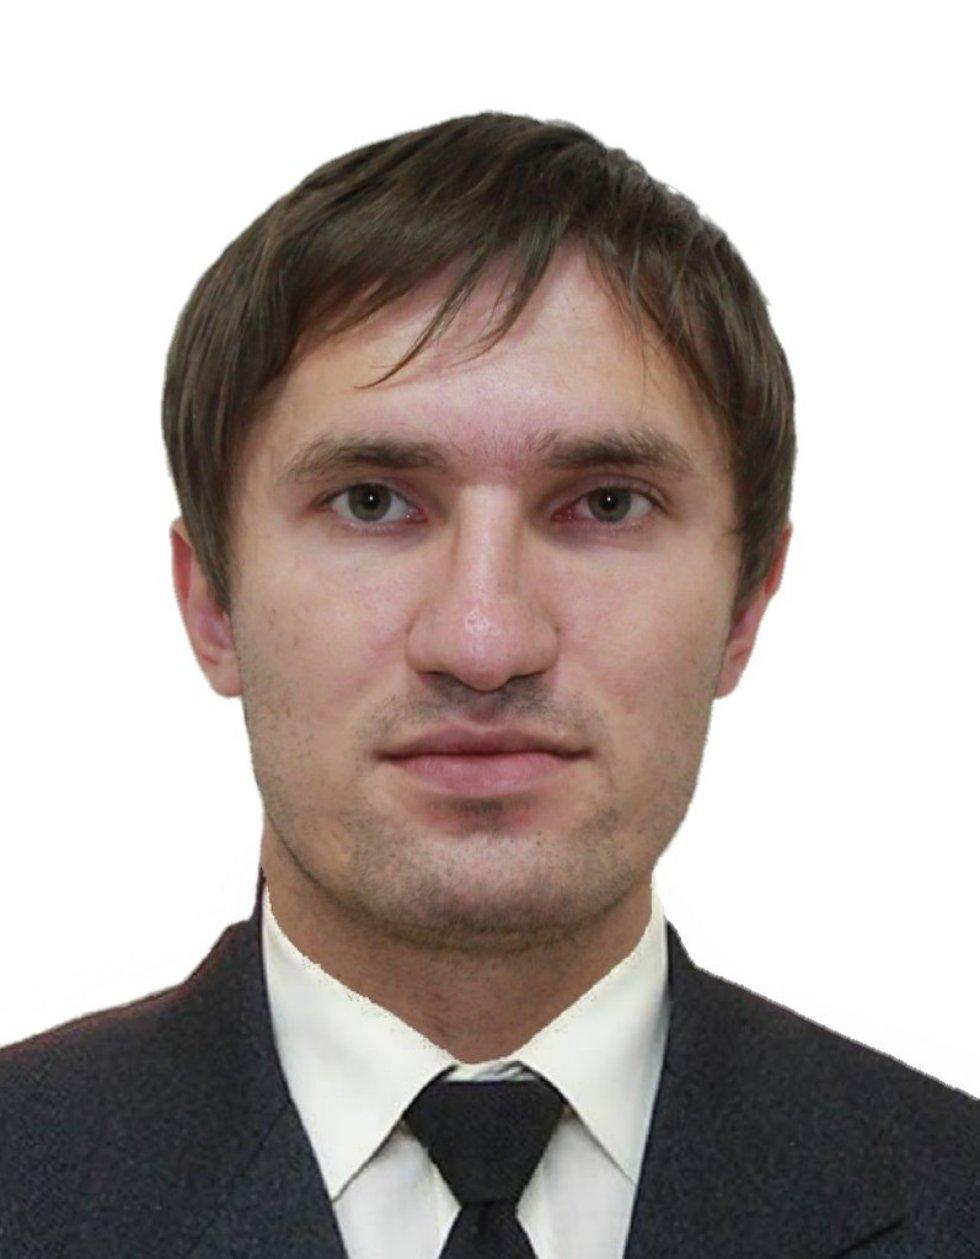 Закиров Алмаз Василович